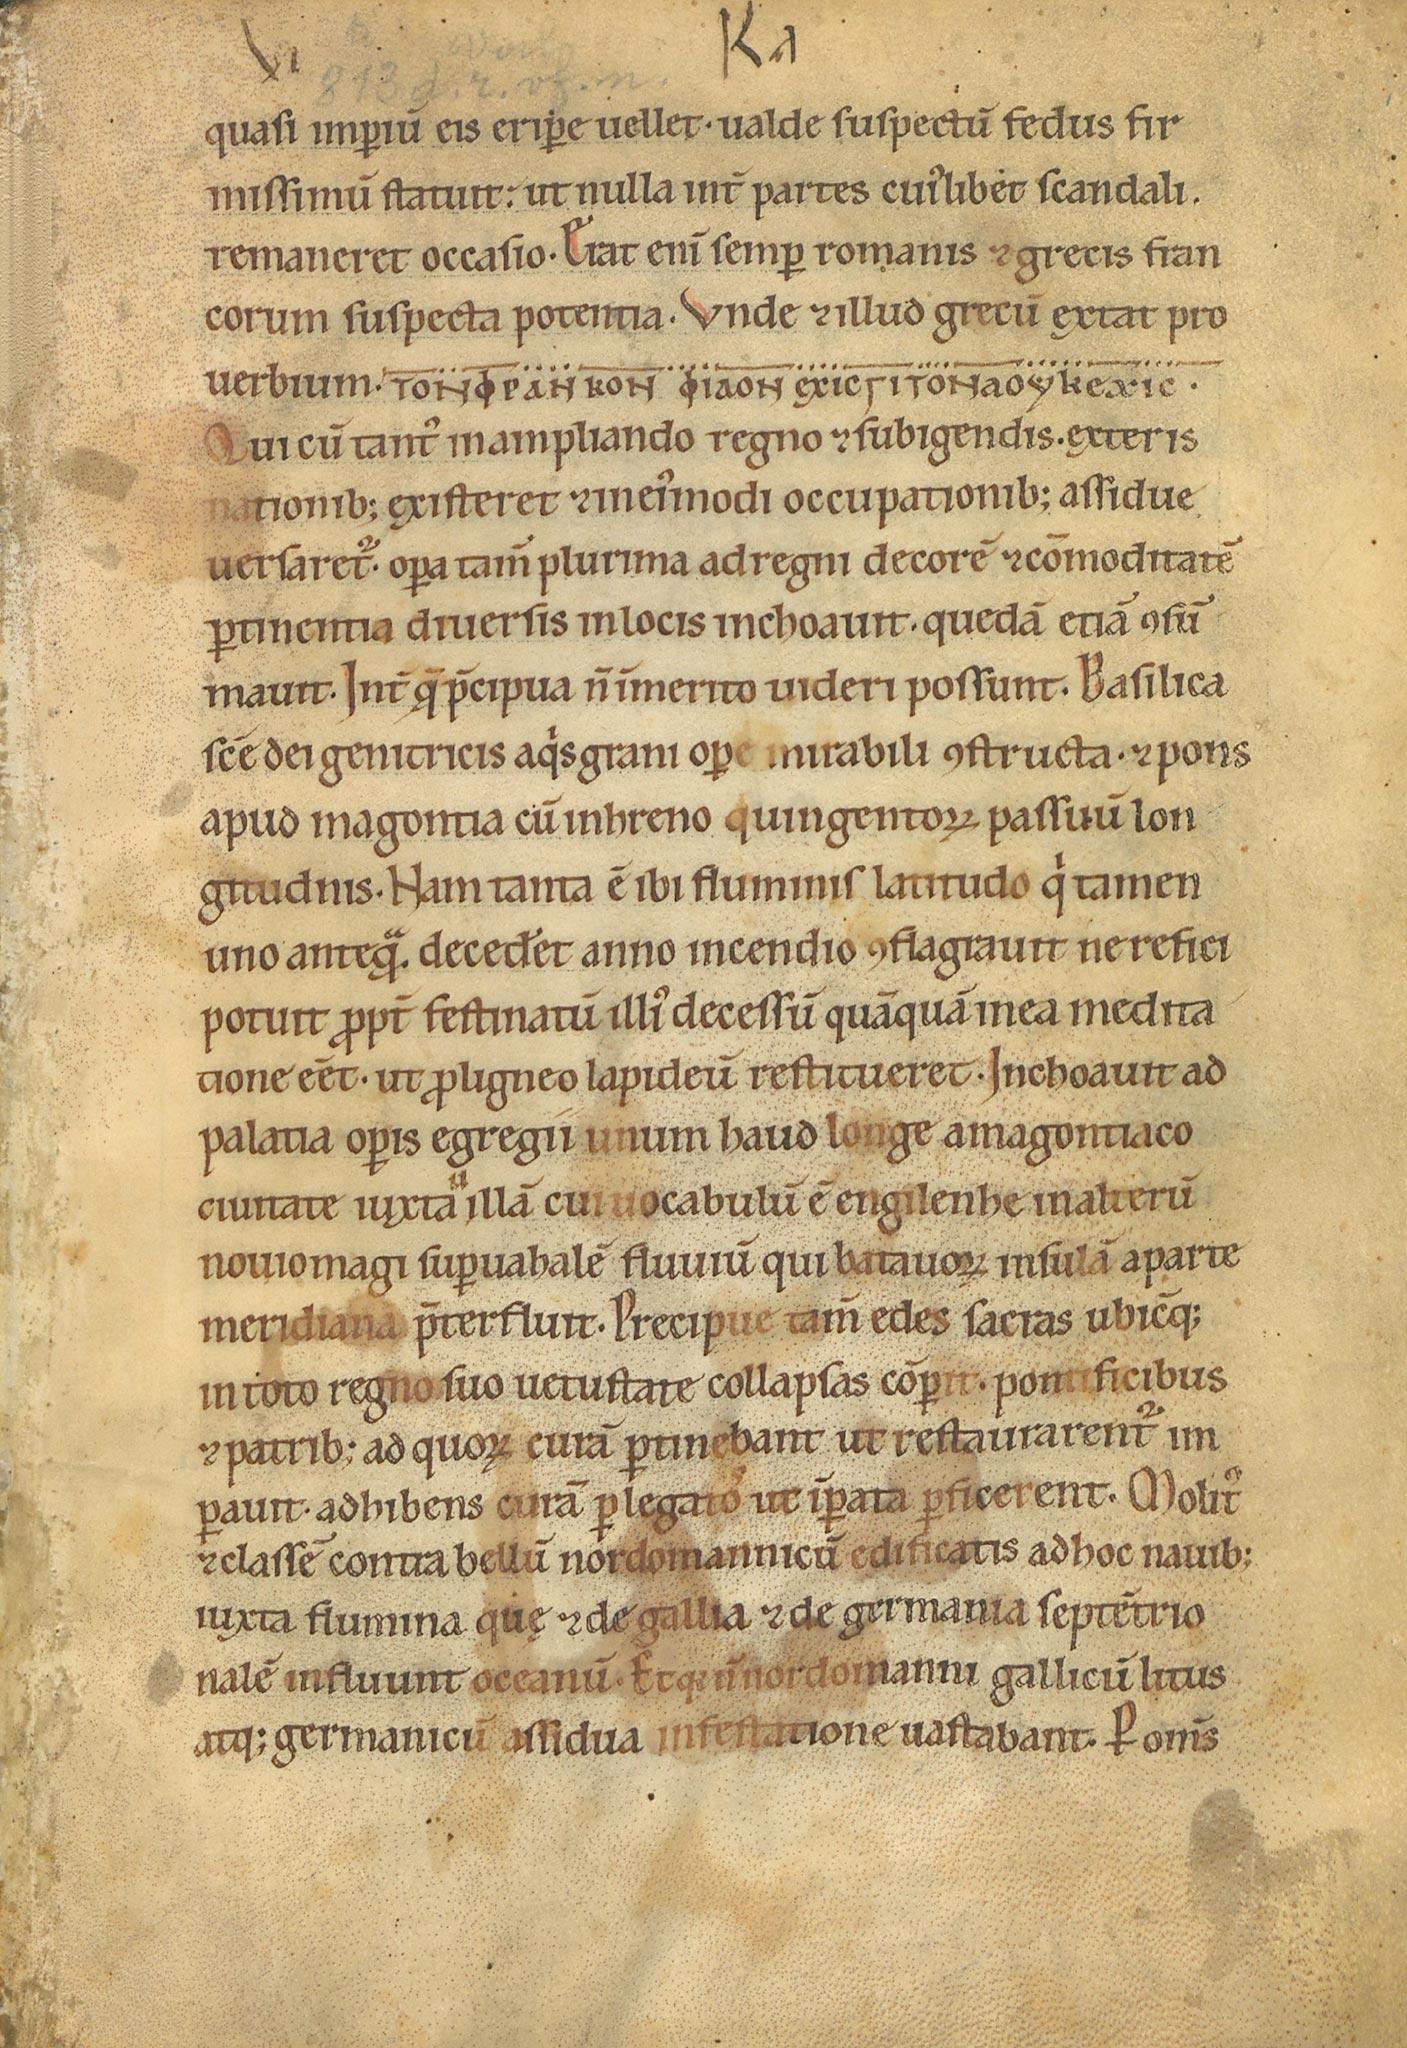 Manuscrit-Vita-Karoli-10r°